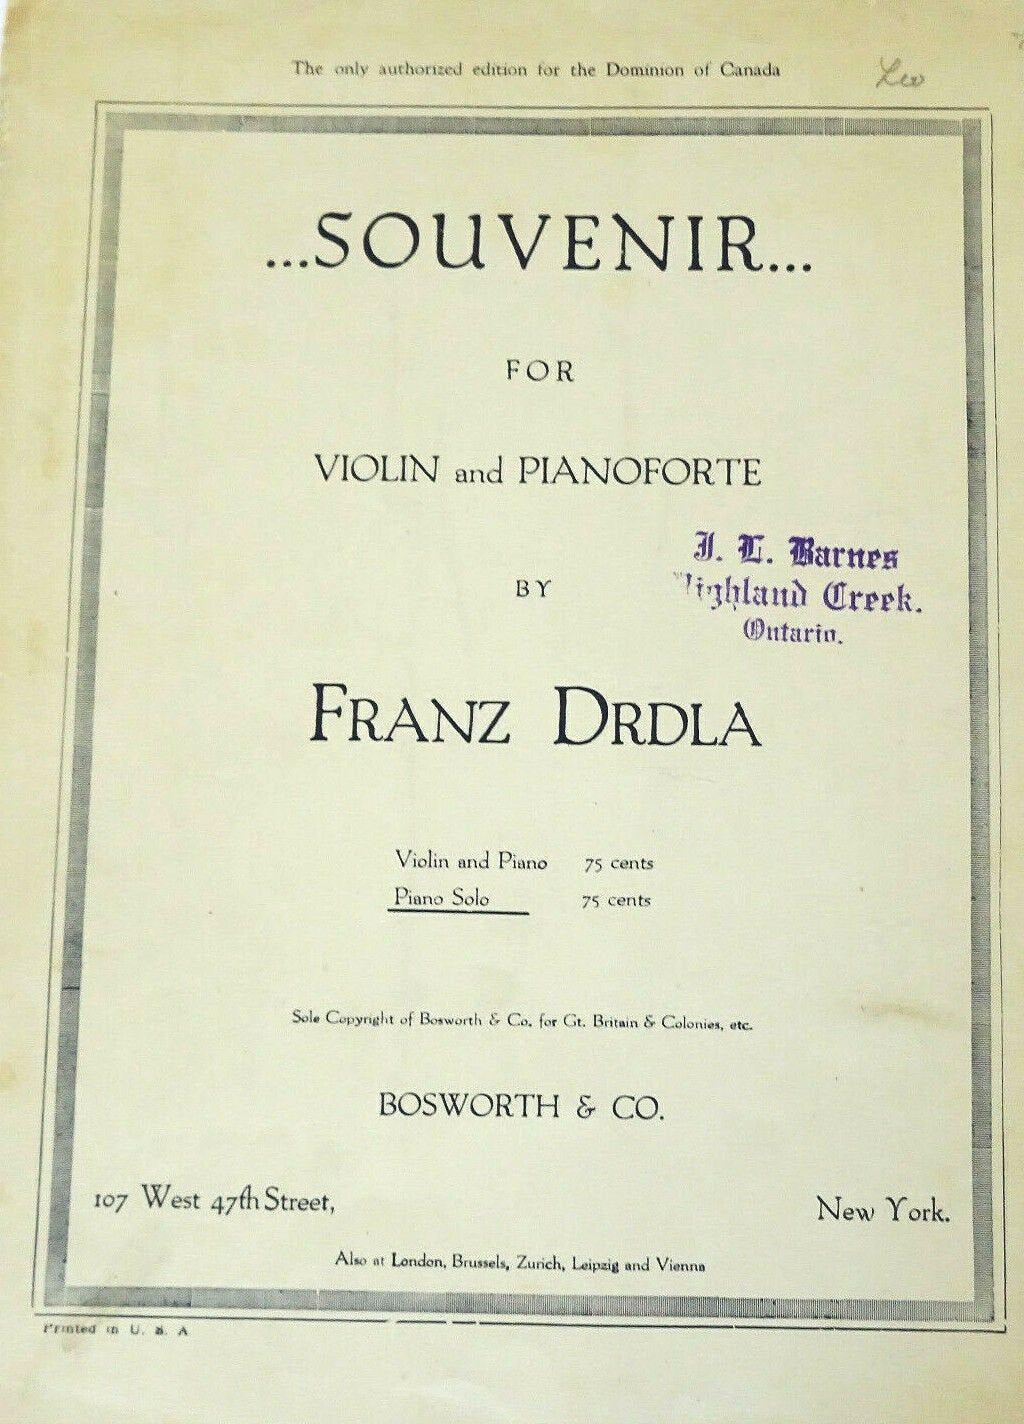 Souvenir by Franz Drdla Piano Solo Vintage Sheet Music 1921 #vintagesheetmusic